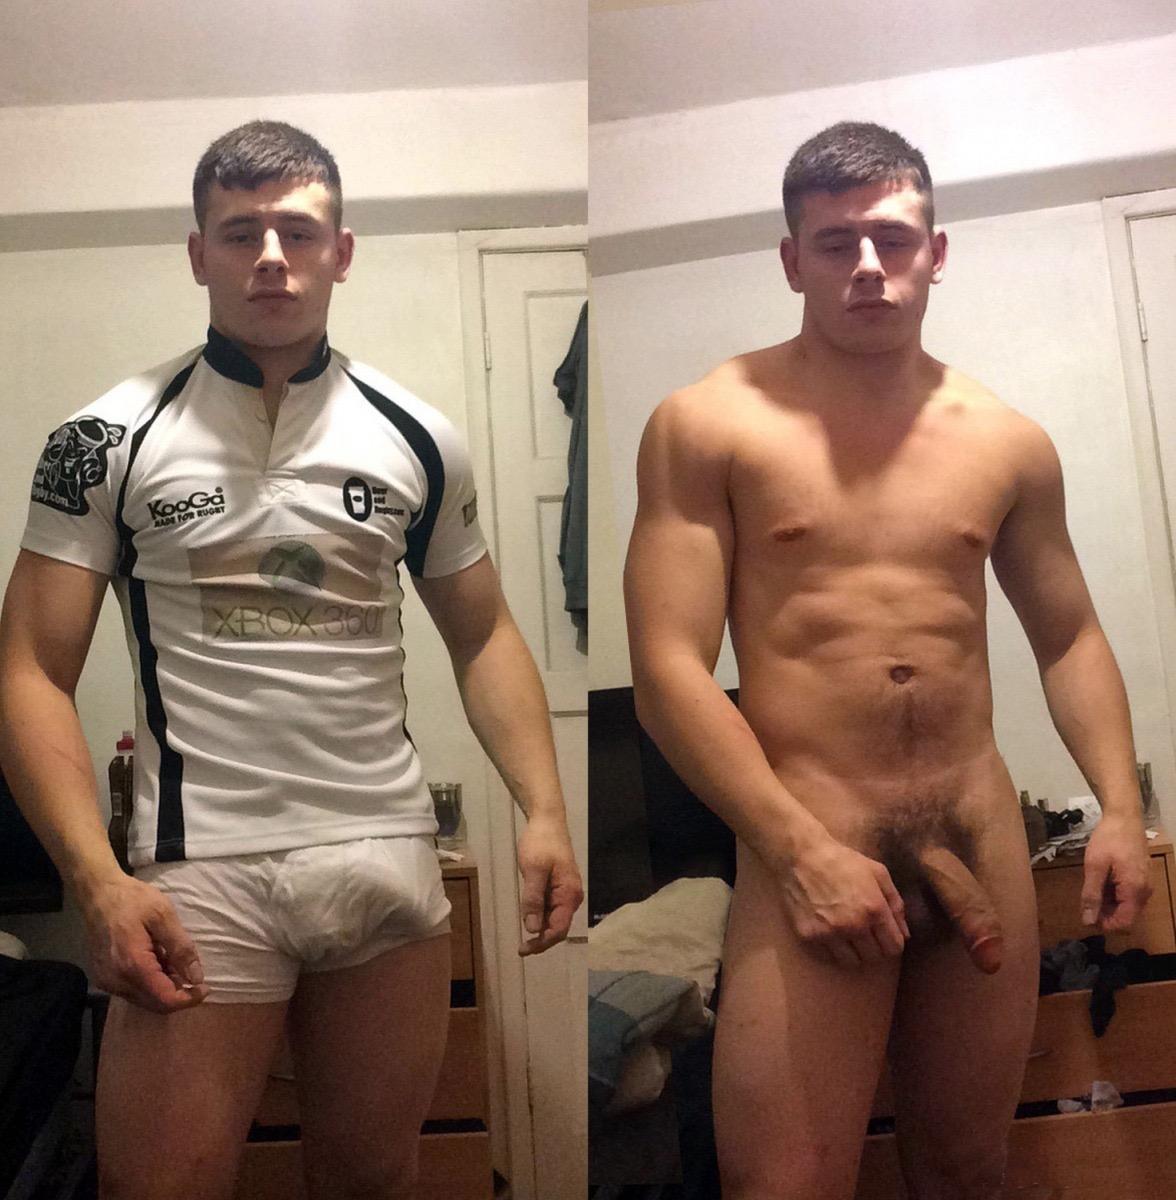 Naked male geek, athletes nude female